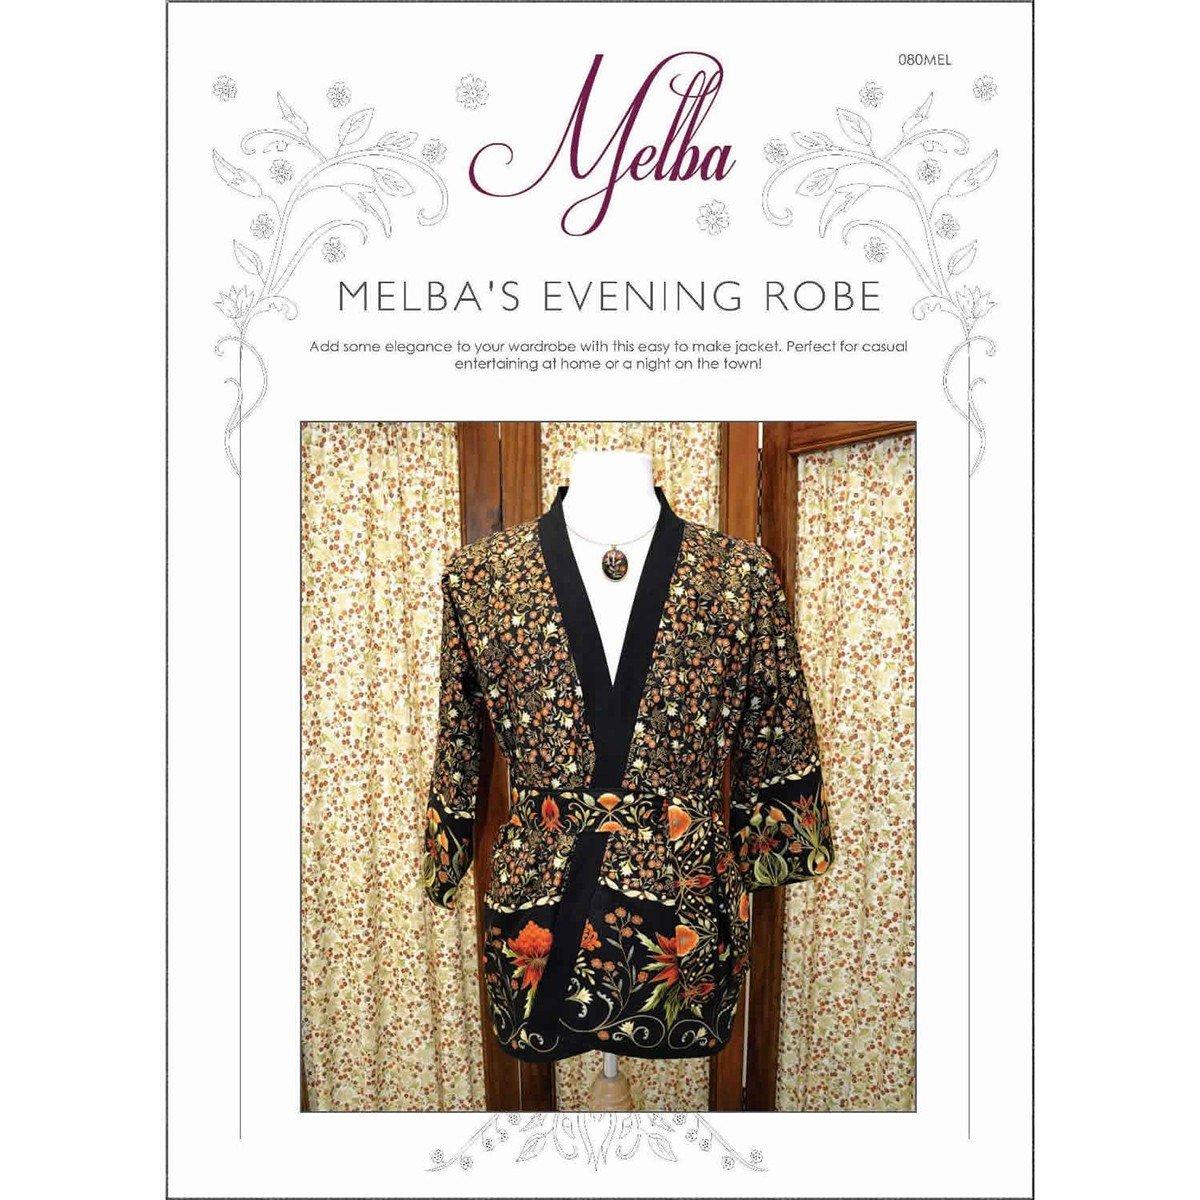 Melbas Evening Robe